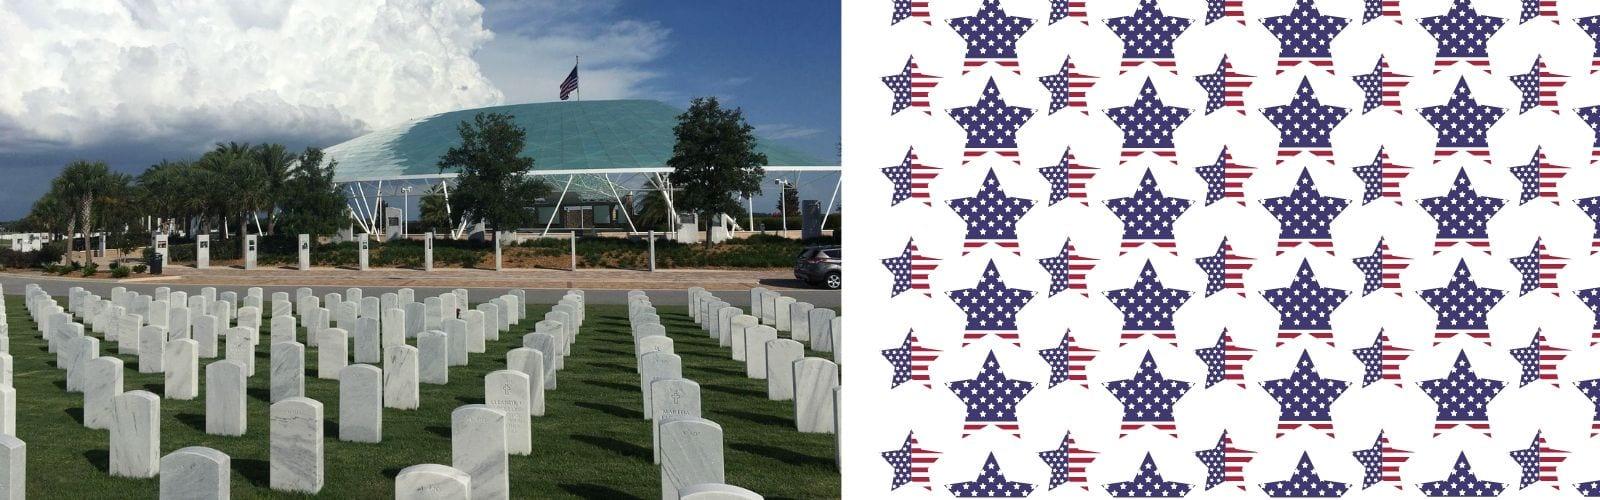 Memorial Day Events in Sarasota